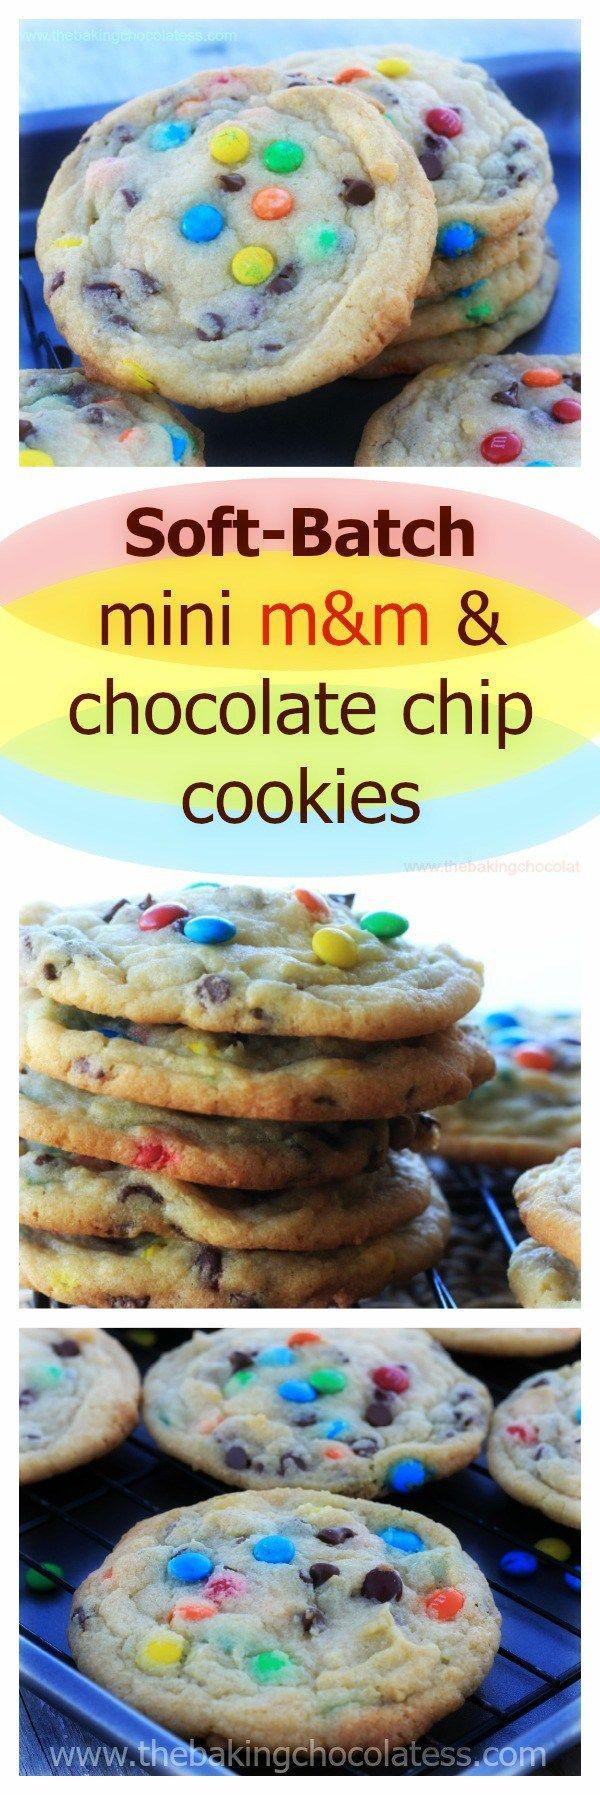 ... 1jasminedesiree I OMG! Soft-Batch Mini M&M & Chocolate Chip Cookies